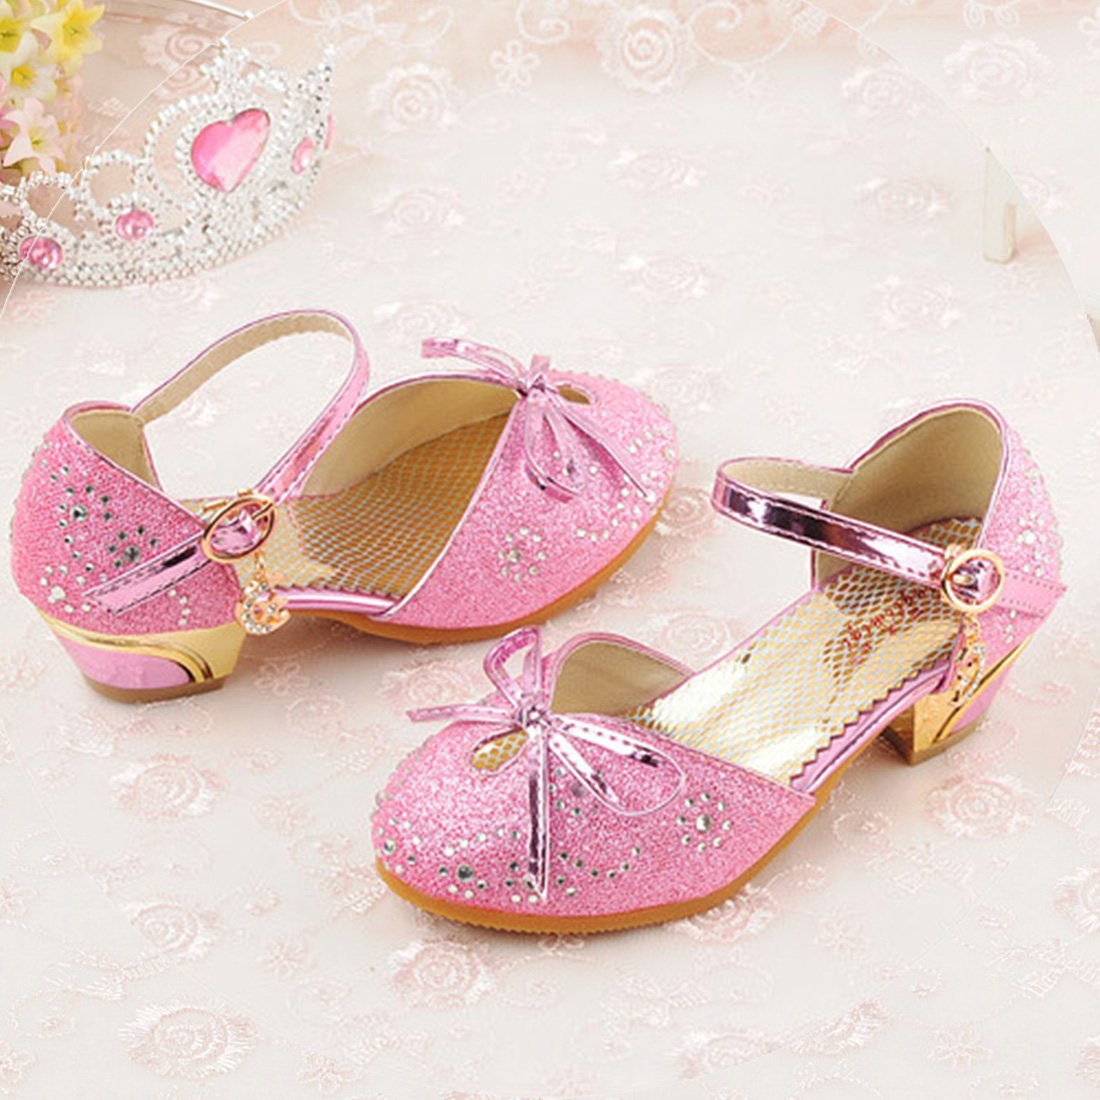 YIBLBOX Girls Kids Toddler Dress up Wedding Cosplay Princess Shoes Glitter Mary Jane Low Heel Shoes by YIBLBOX (Image #3)